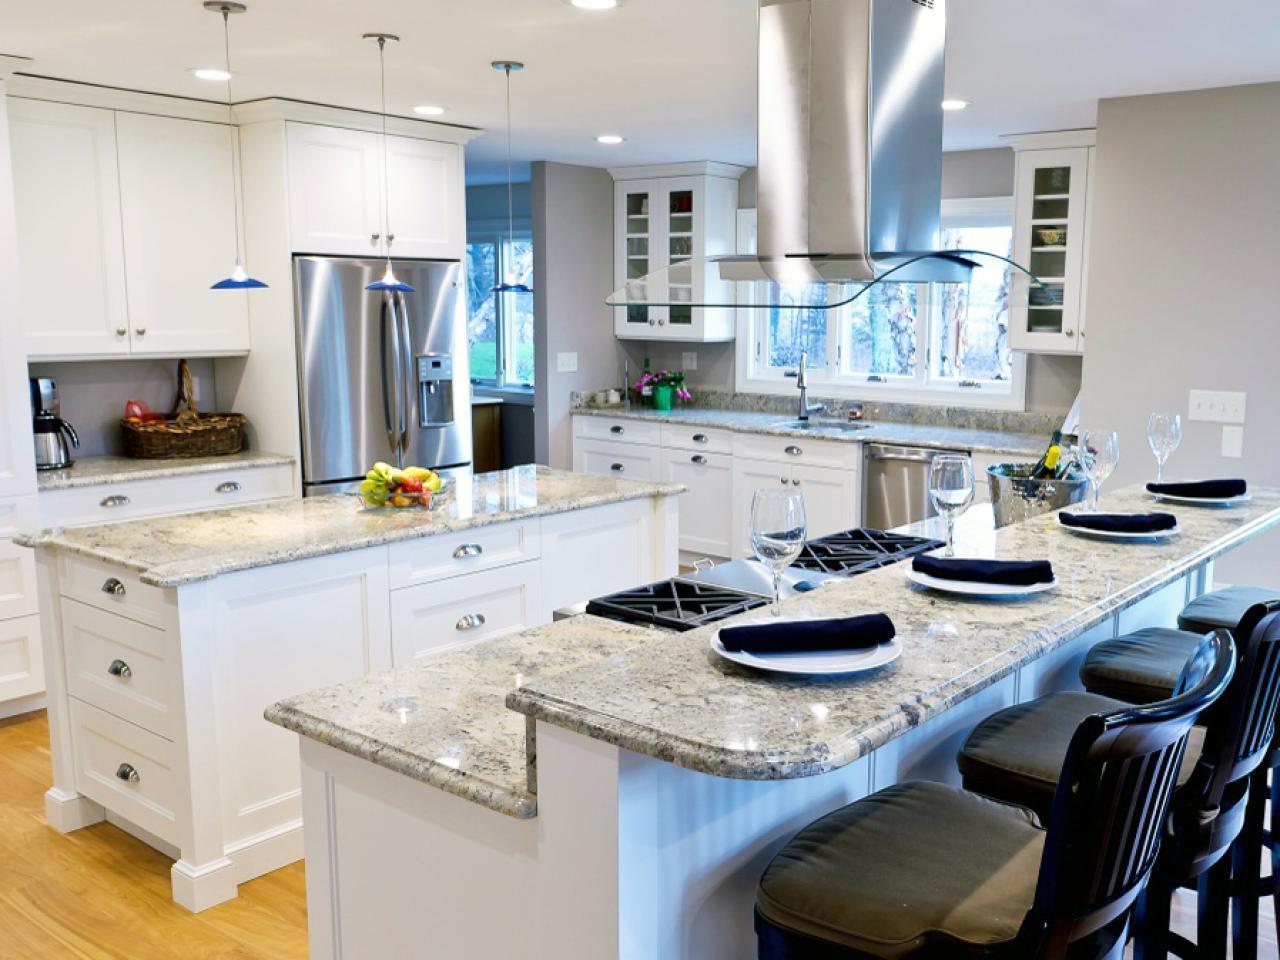 unconventional lighting - Top Kitchen Design